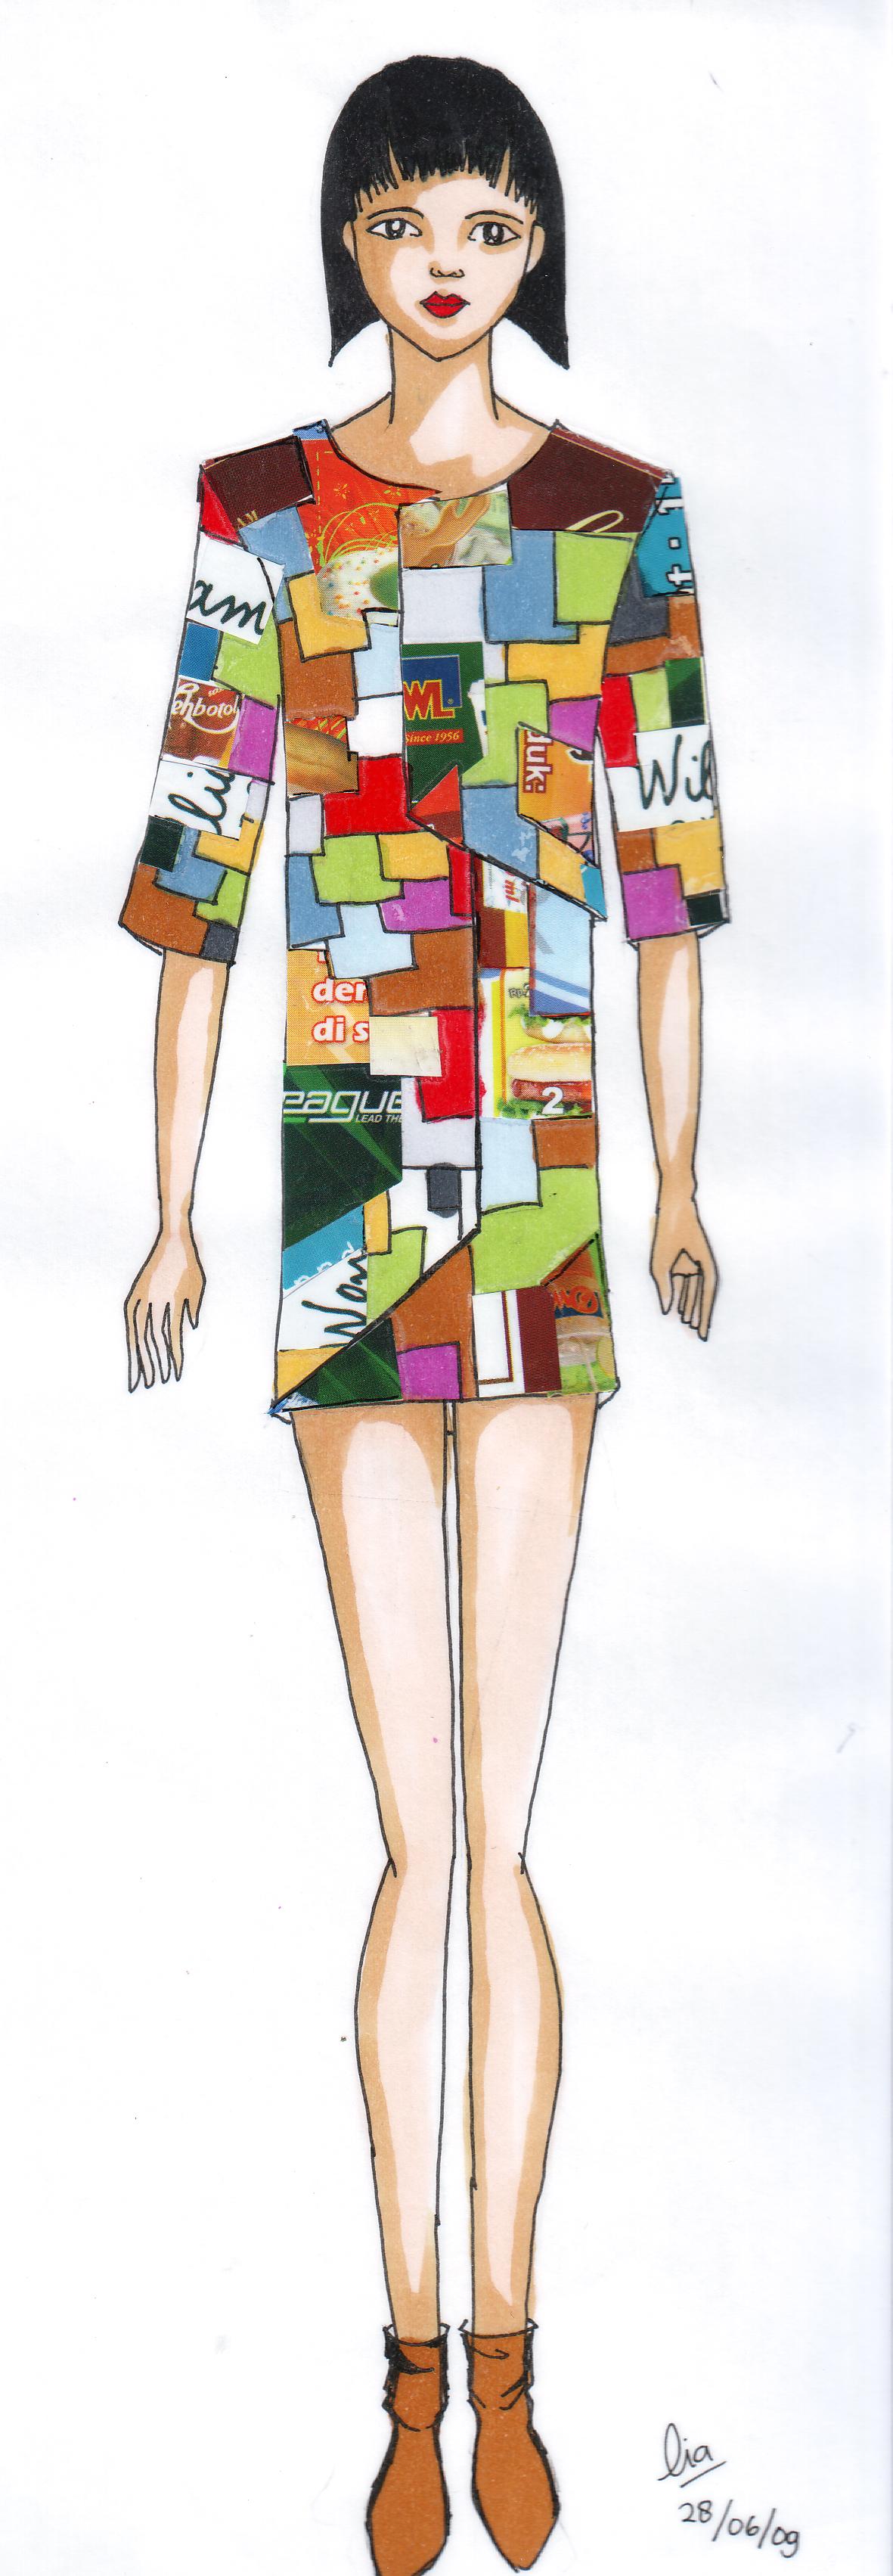 fashion illustration kursus kursus tata busana fashion design kursus tata busana wiwi